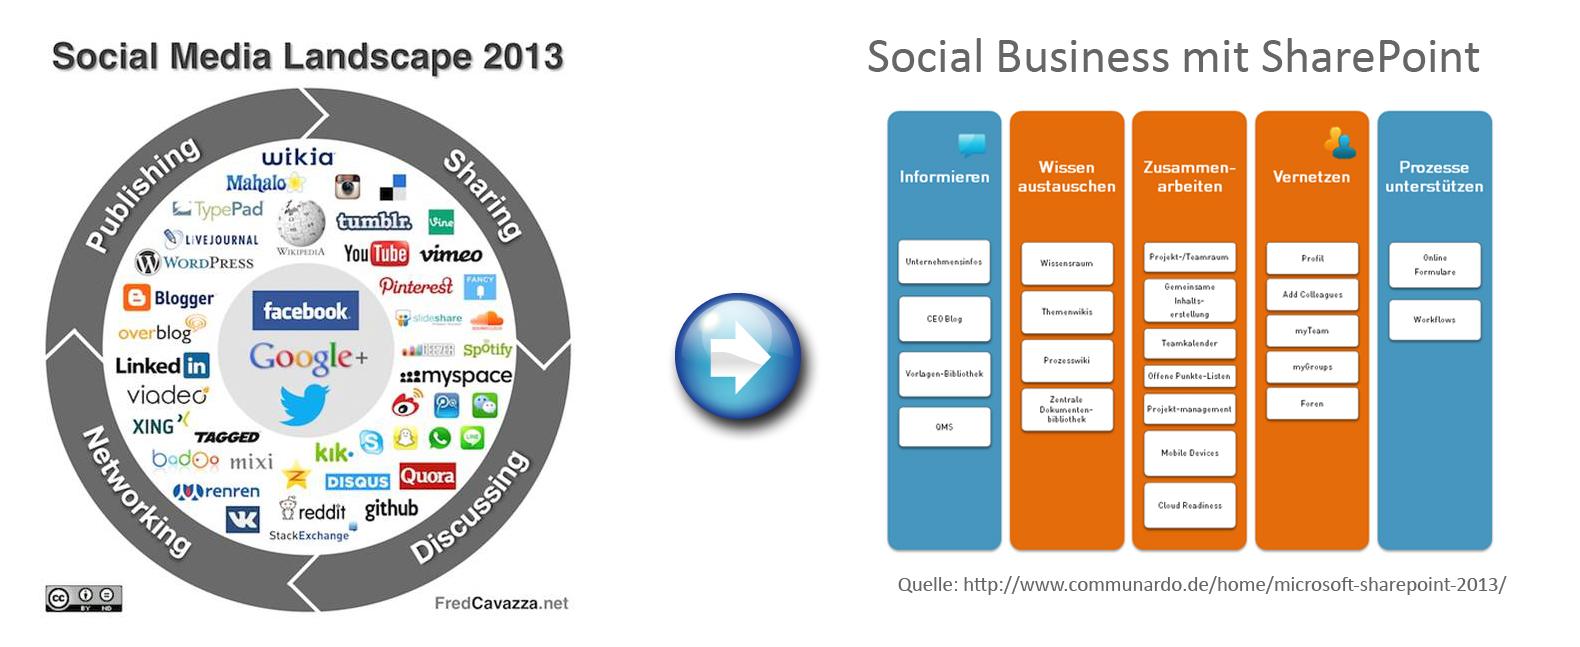 Aus Social Media wird Social Business